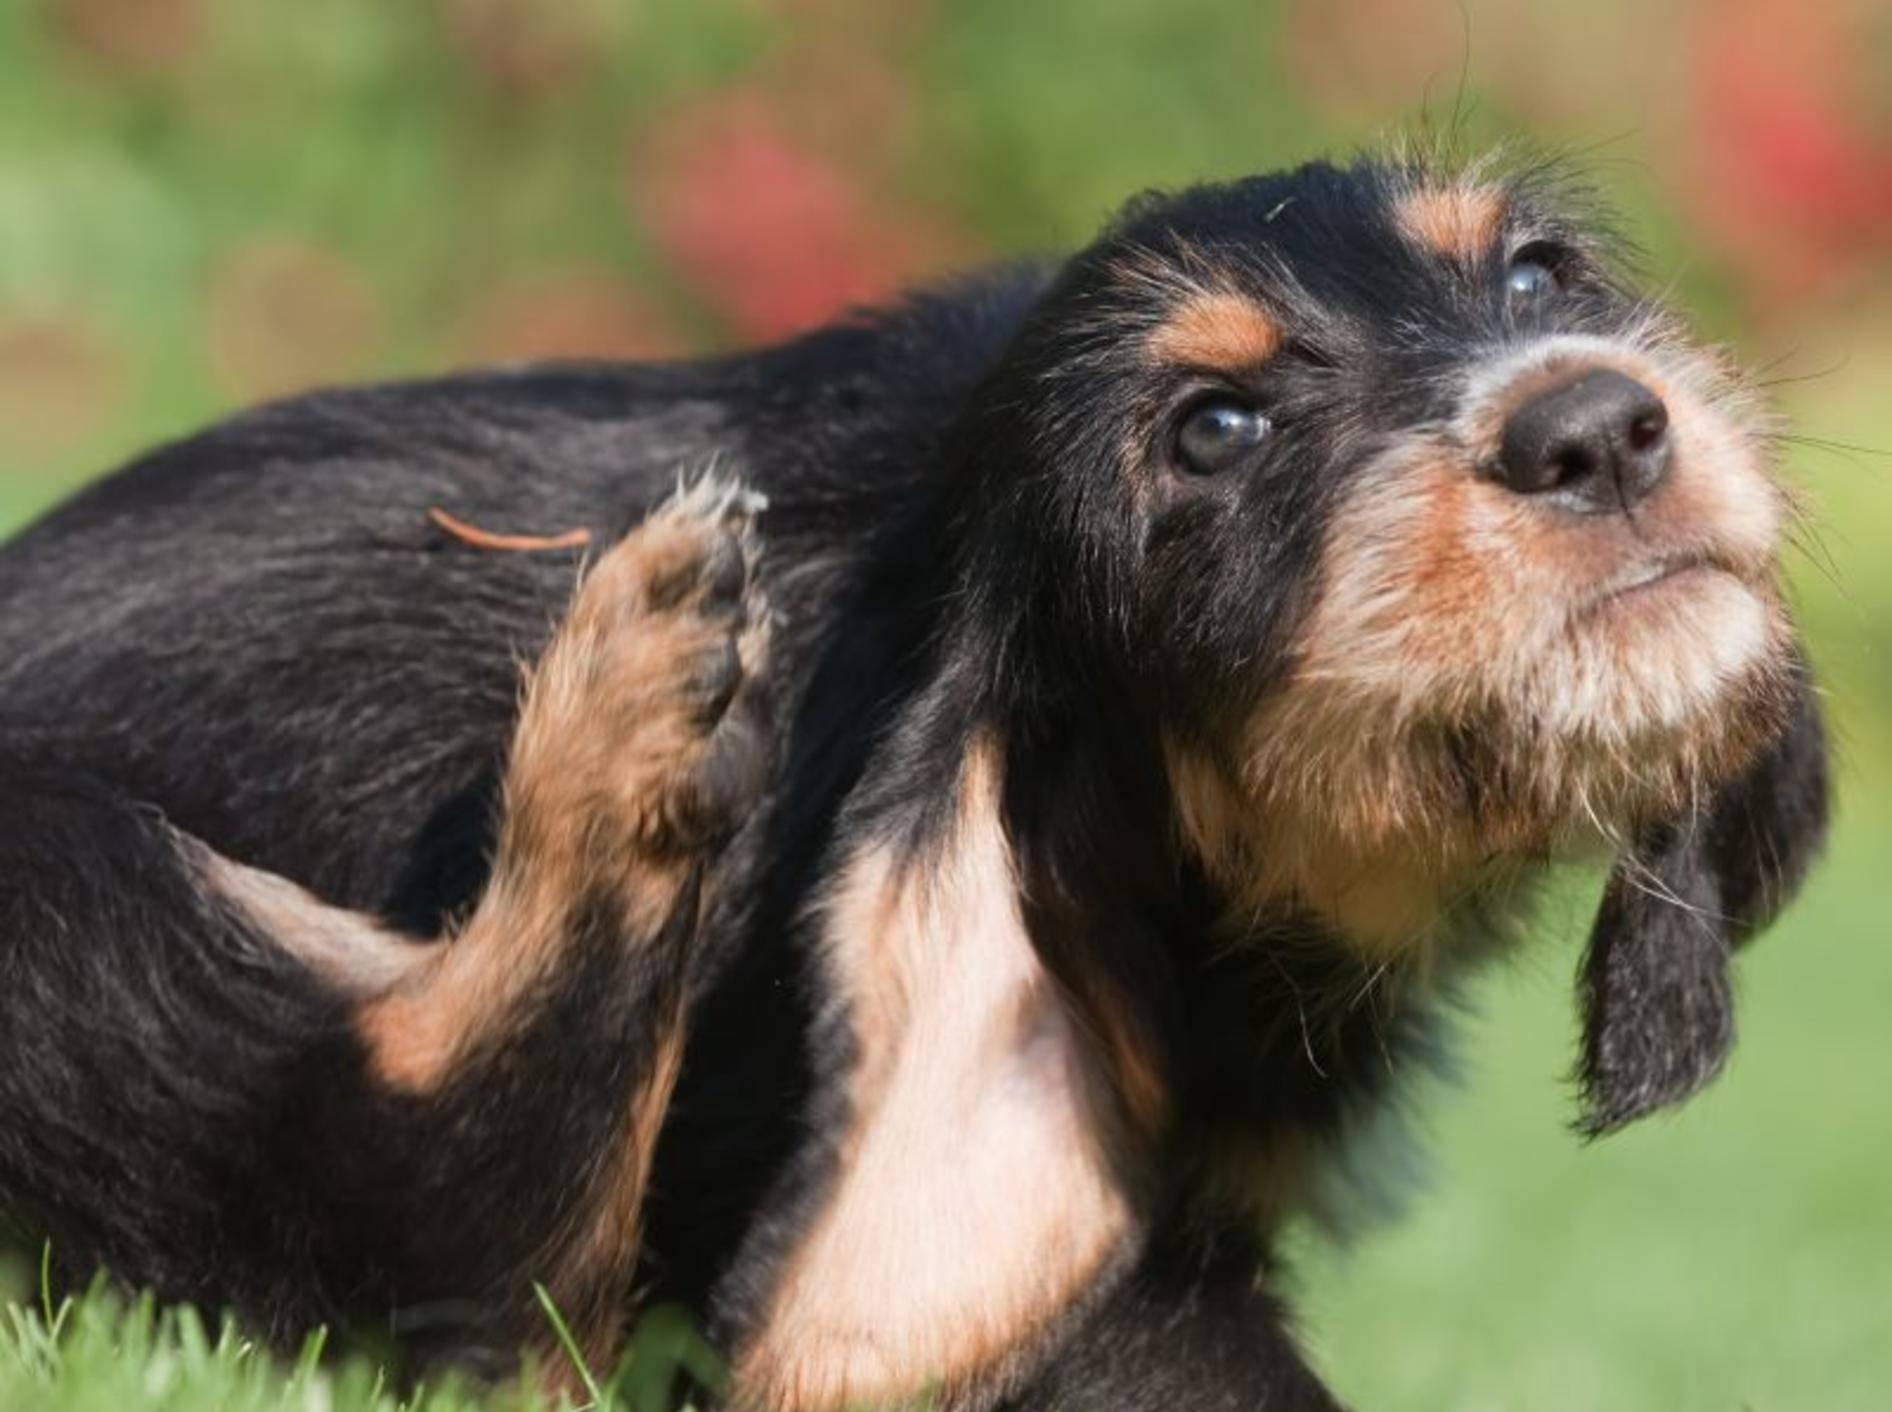 Flöhe beim Hund: Symptome des Befalls – Bild: Shutterstock / Christian Mueller